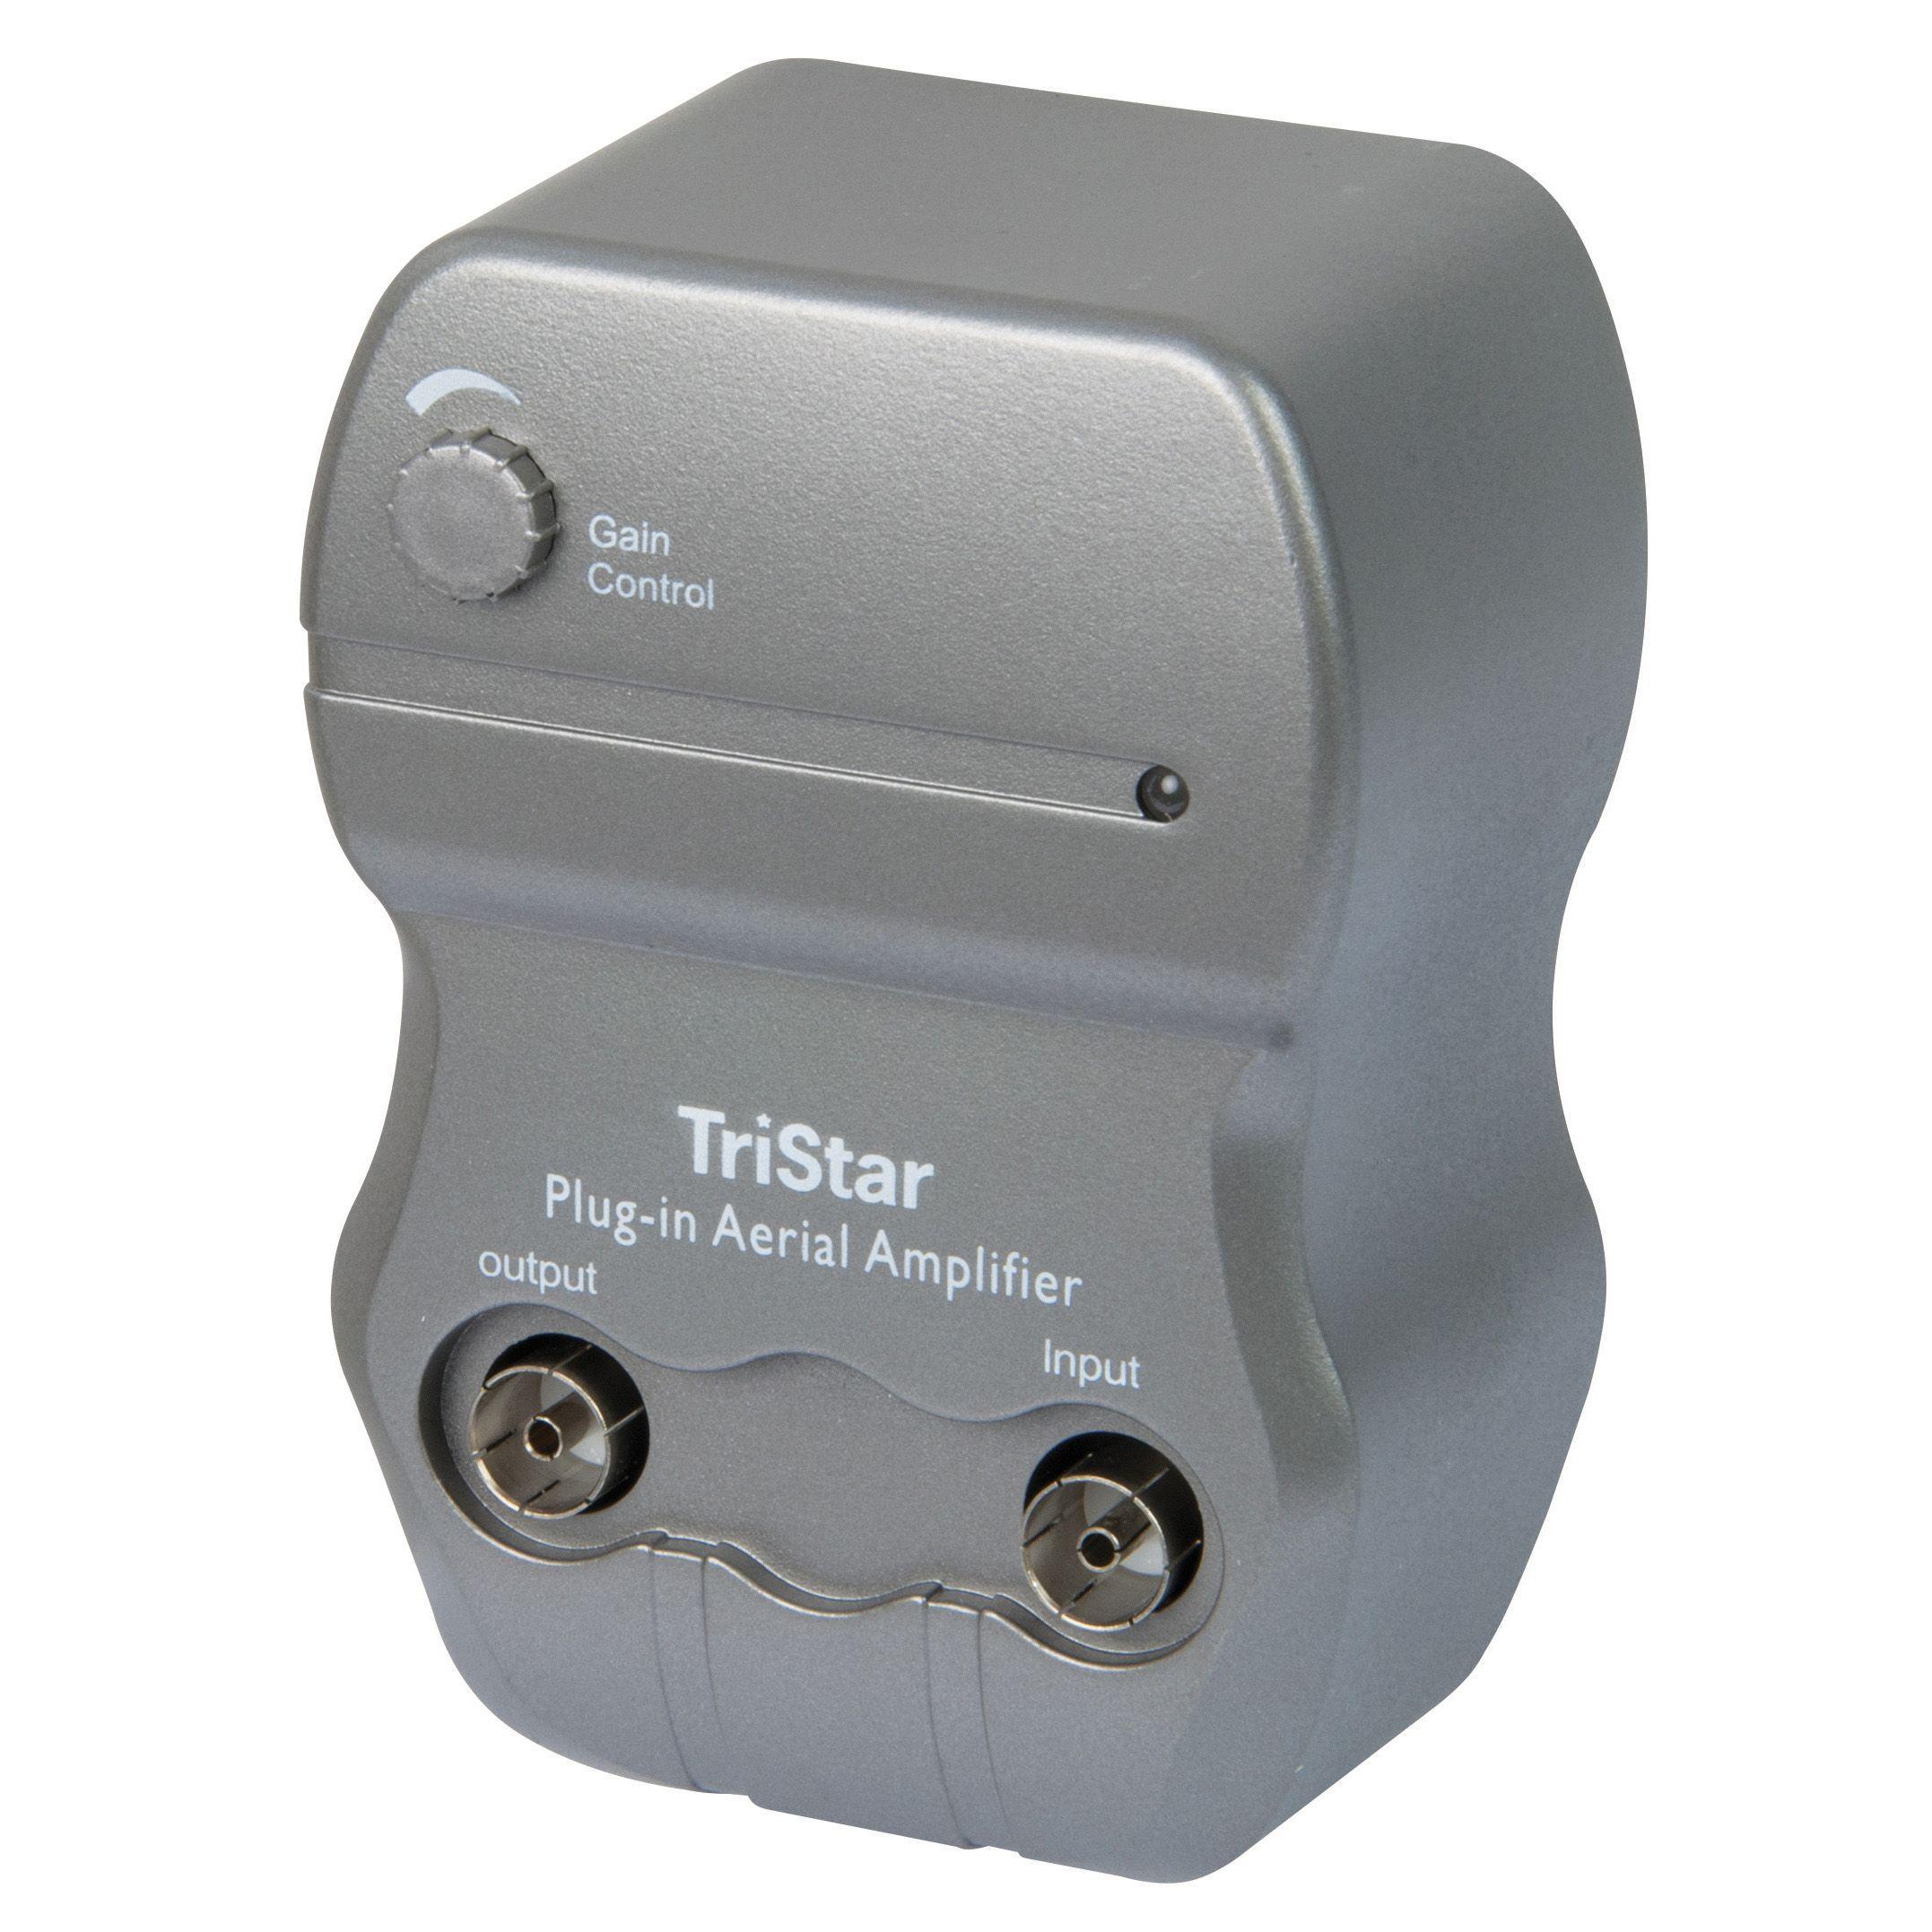 tristar 8 8 way pro amplifier departments diy at b q tristar 1 1 way signal amplifier